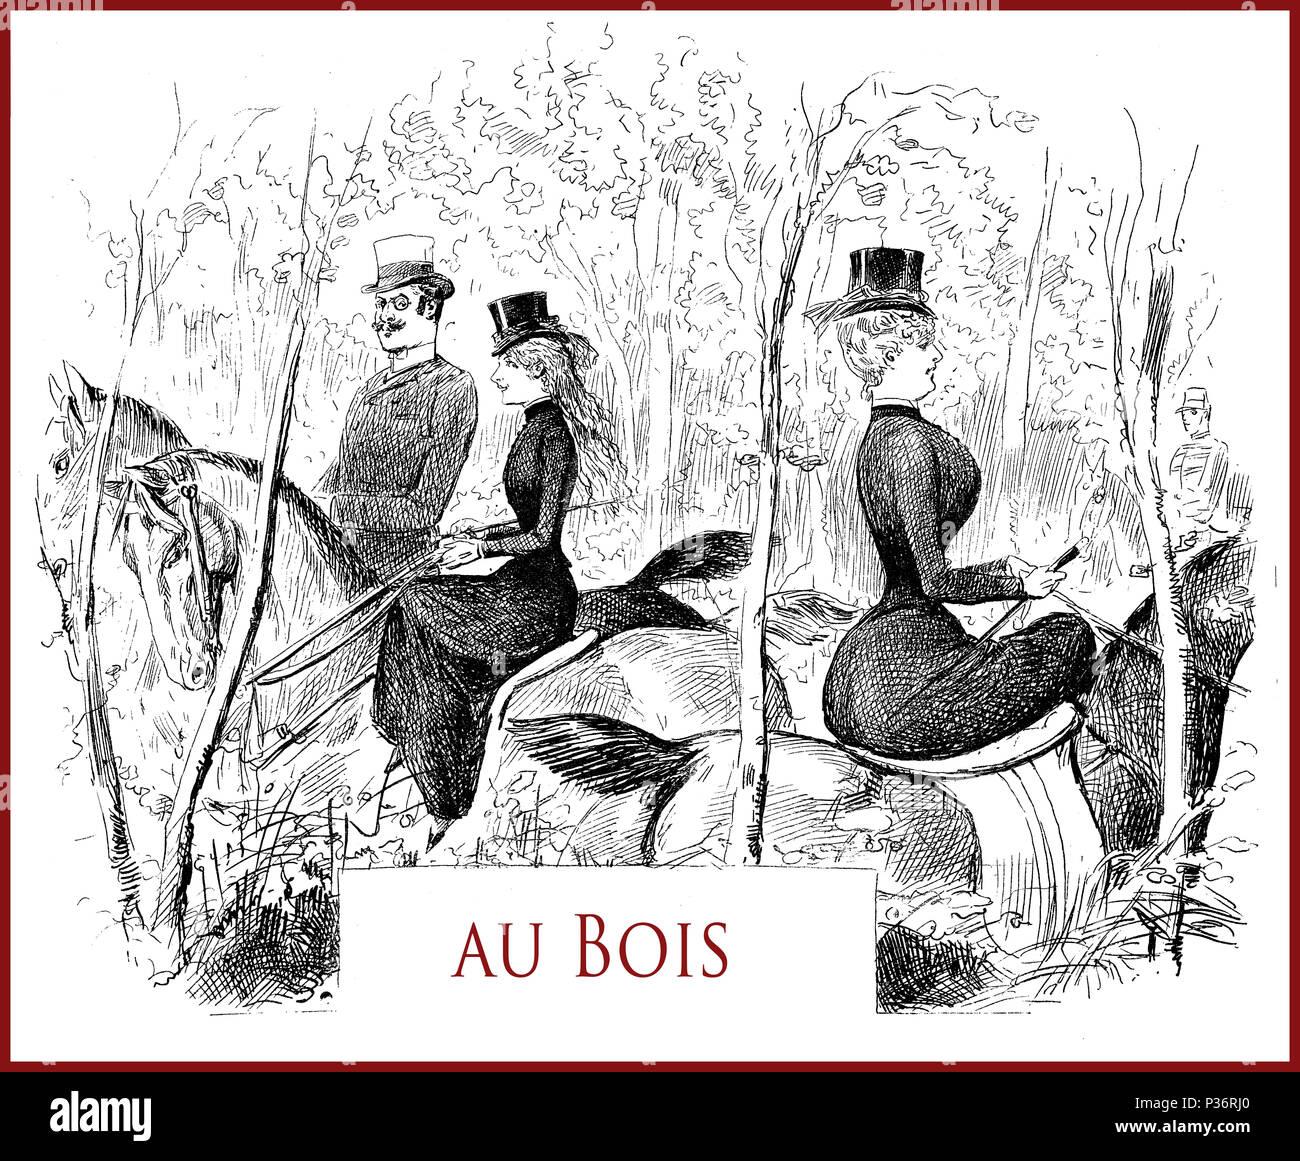 French satirical magazine La vie Parisienne 1888, riding at Bois de Boulogne, portraits, caricatures and humor Stock Photo